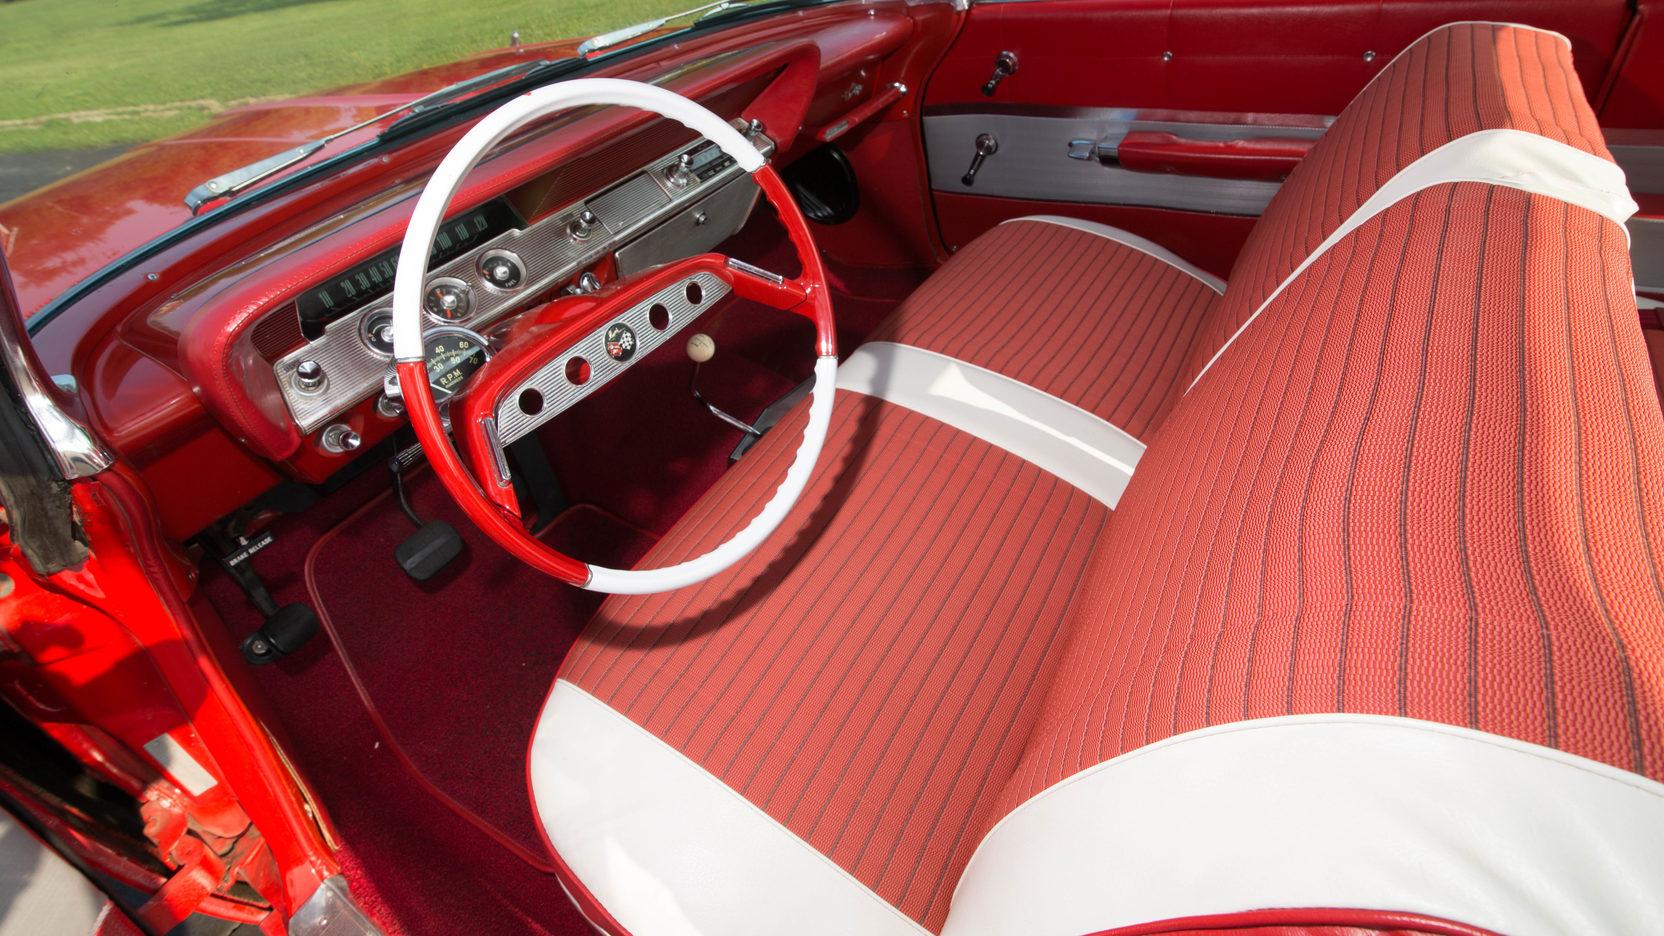 1961 Chevrolet Impala interior